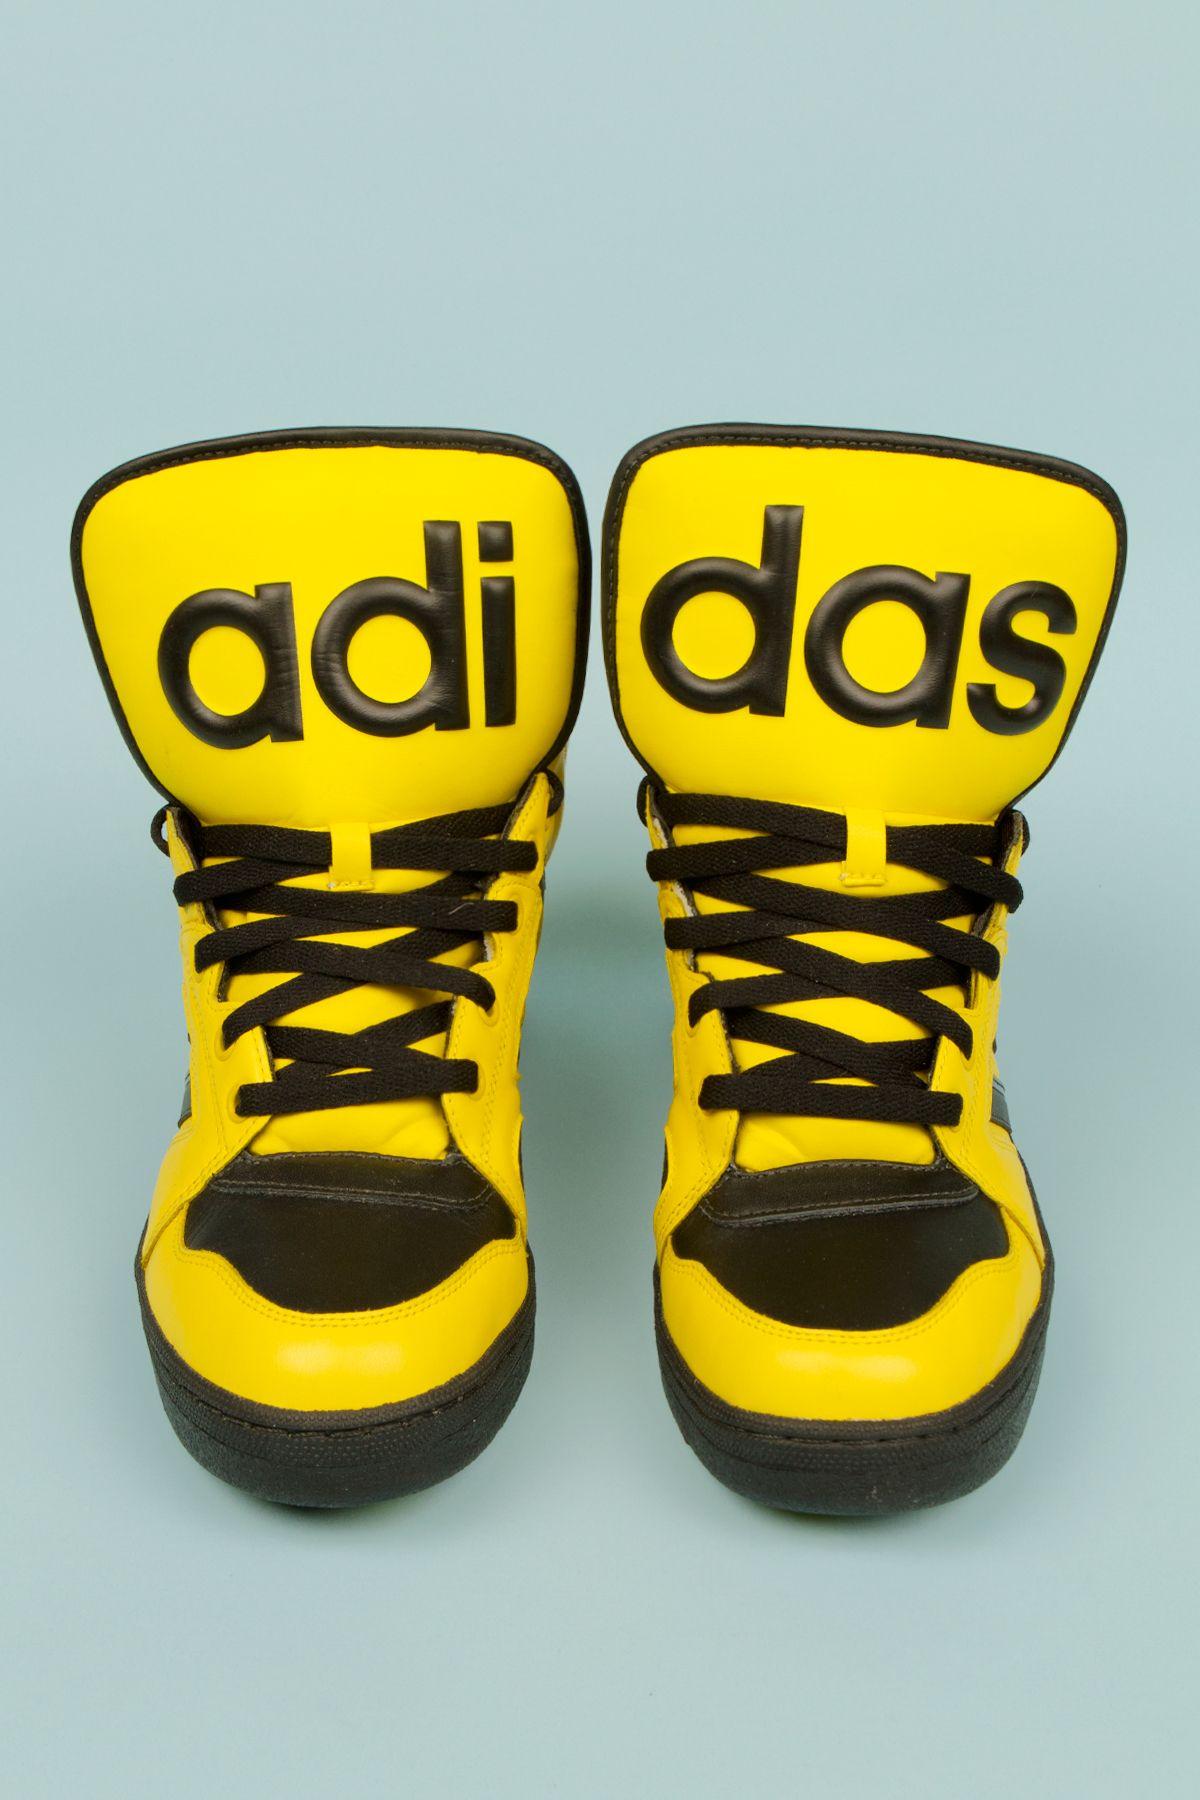 adidas originals x jeremy scott instinct high top sneakers